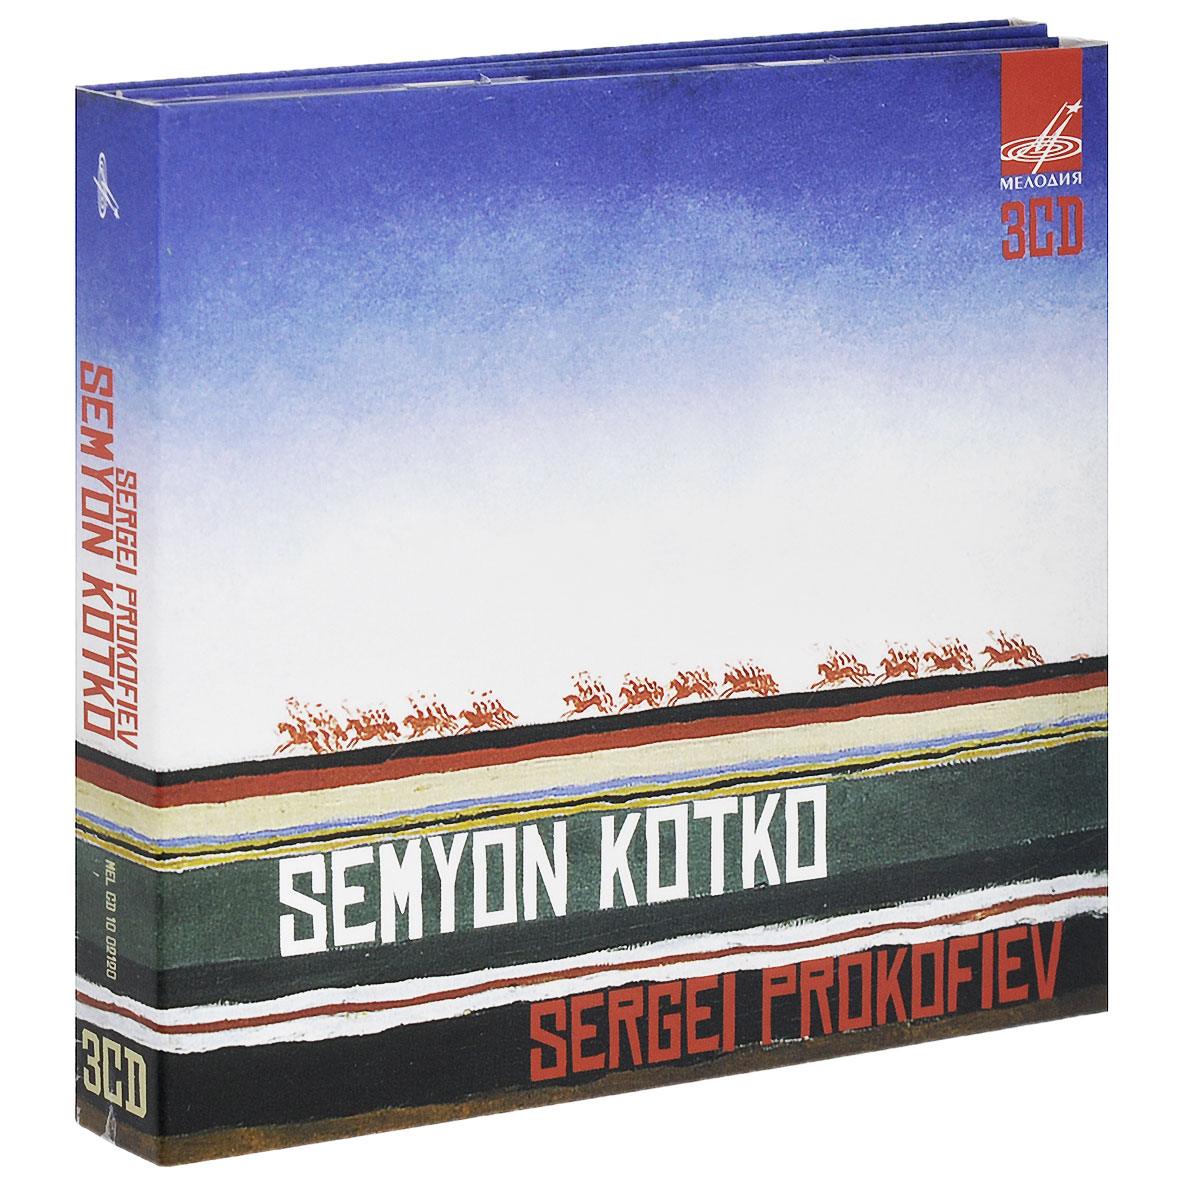 цена на Sergei Prokofiev. Semyon Kotko (3 CD)